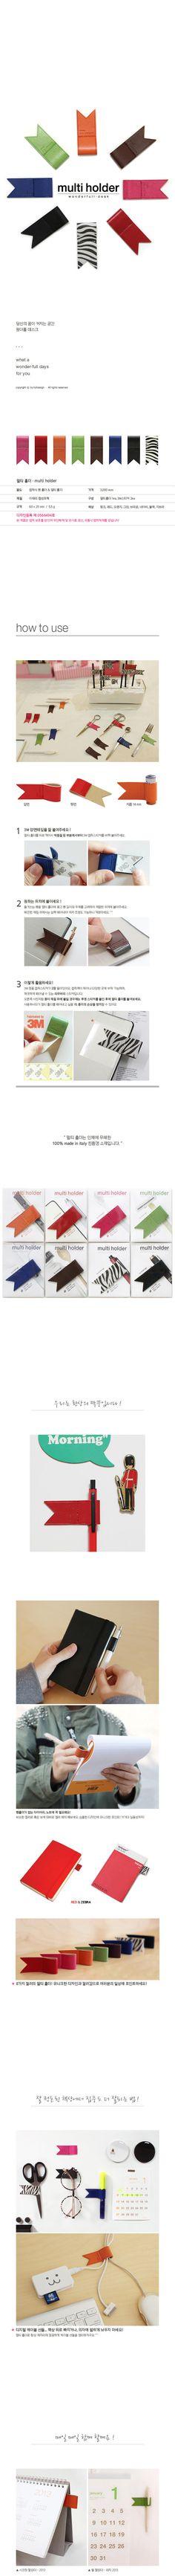 Full - Leather Pen & Book Mark/Label